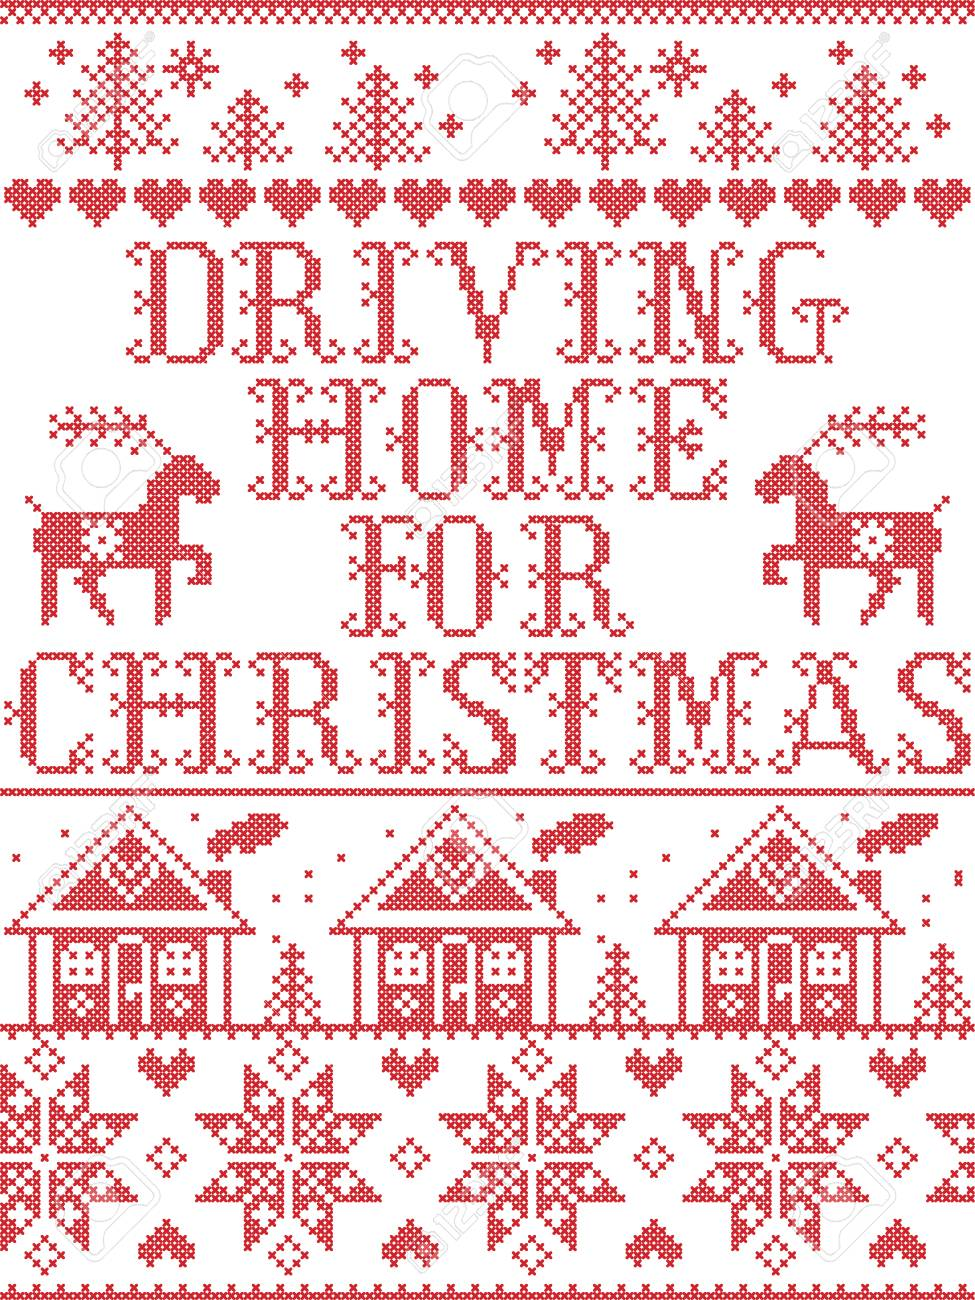 Driving Home For Christmas.Christmas Pattern Driving Home For Christmas Carol Vector Seamless